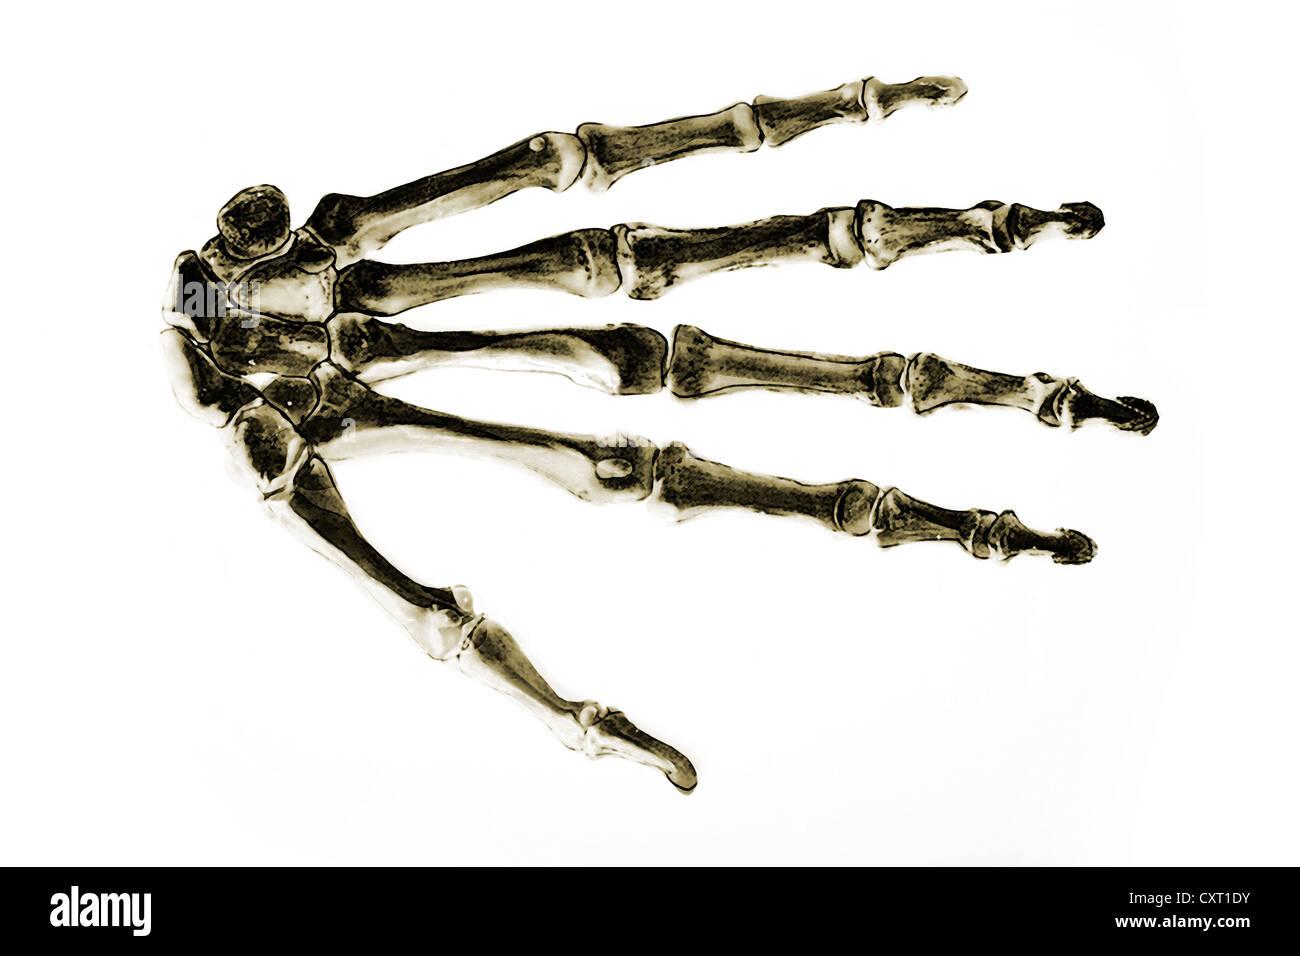 Hand Drawn Illustration Drawing Human Stockfotos & Hand Drawn ...